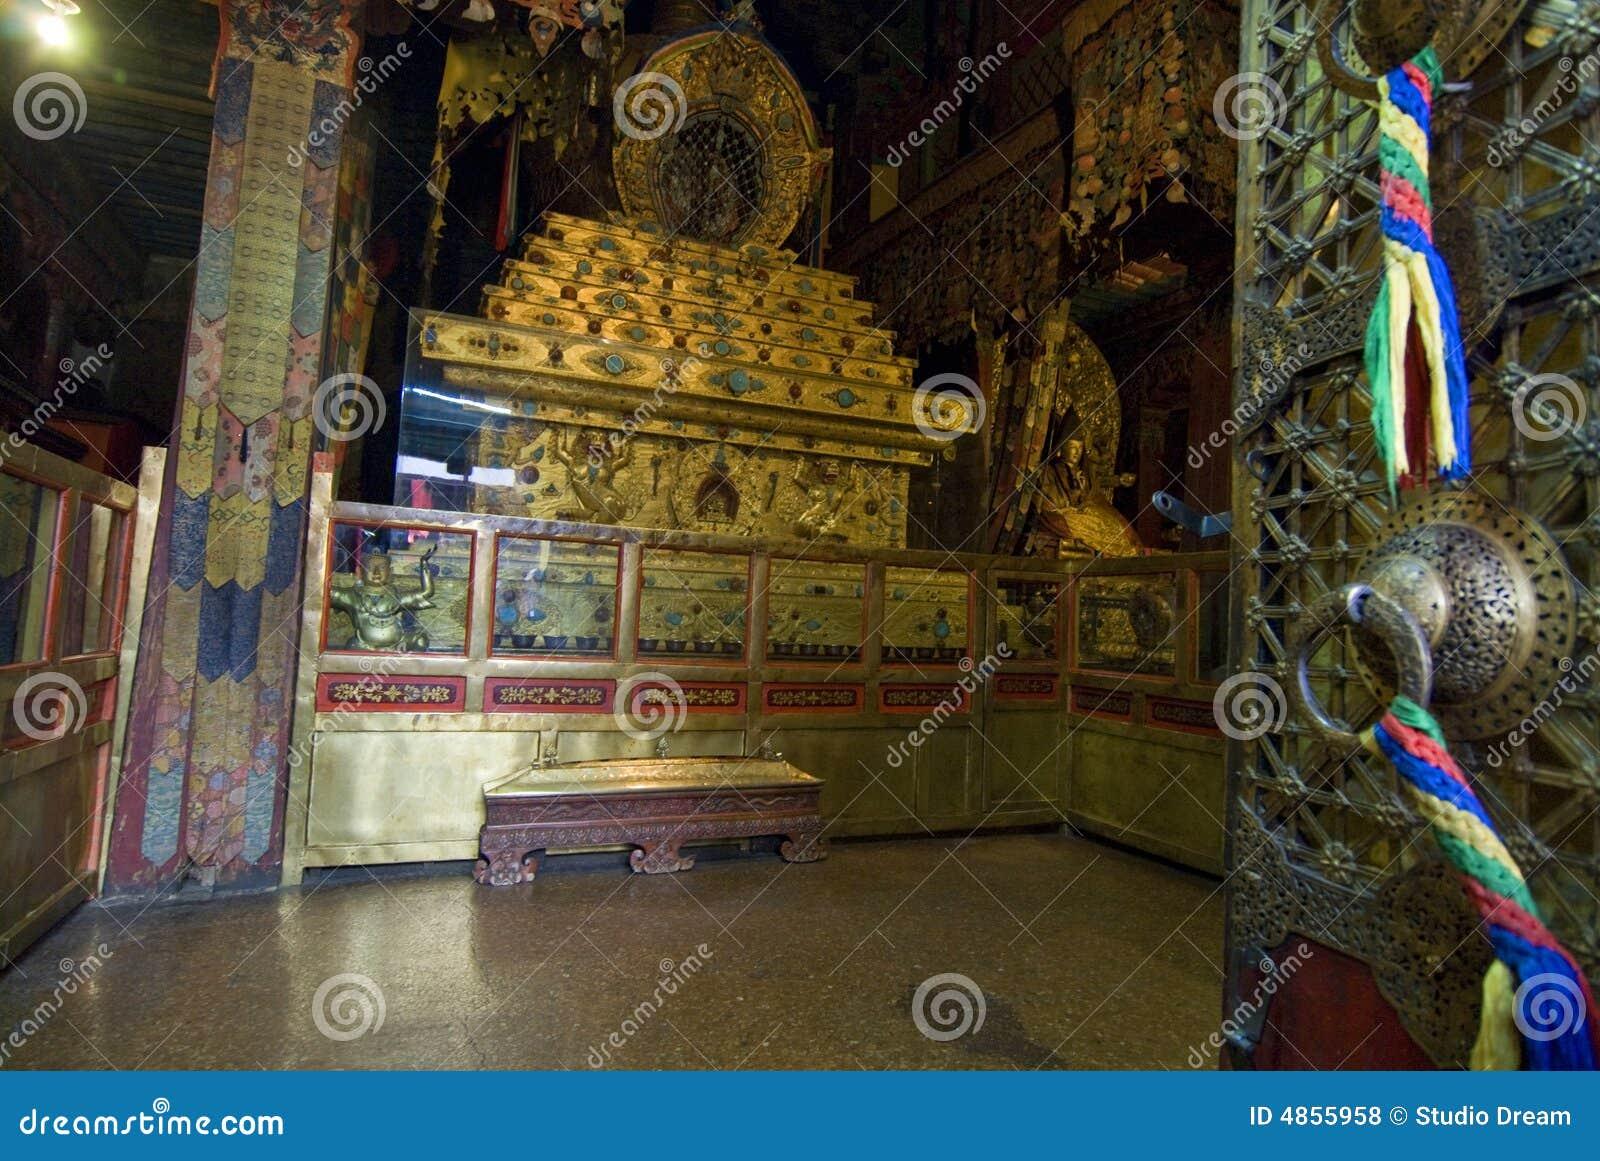 Binnen het Paleis Potala